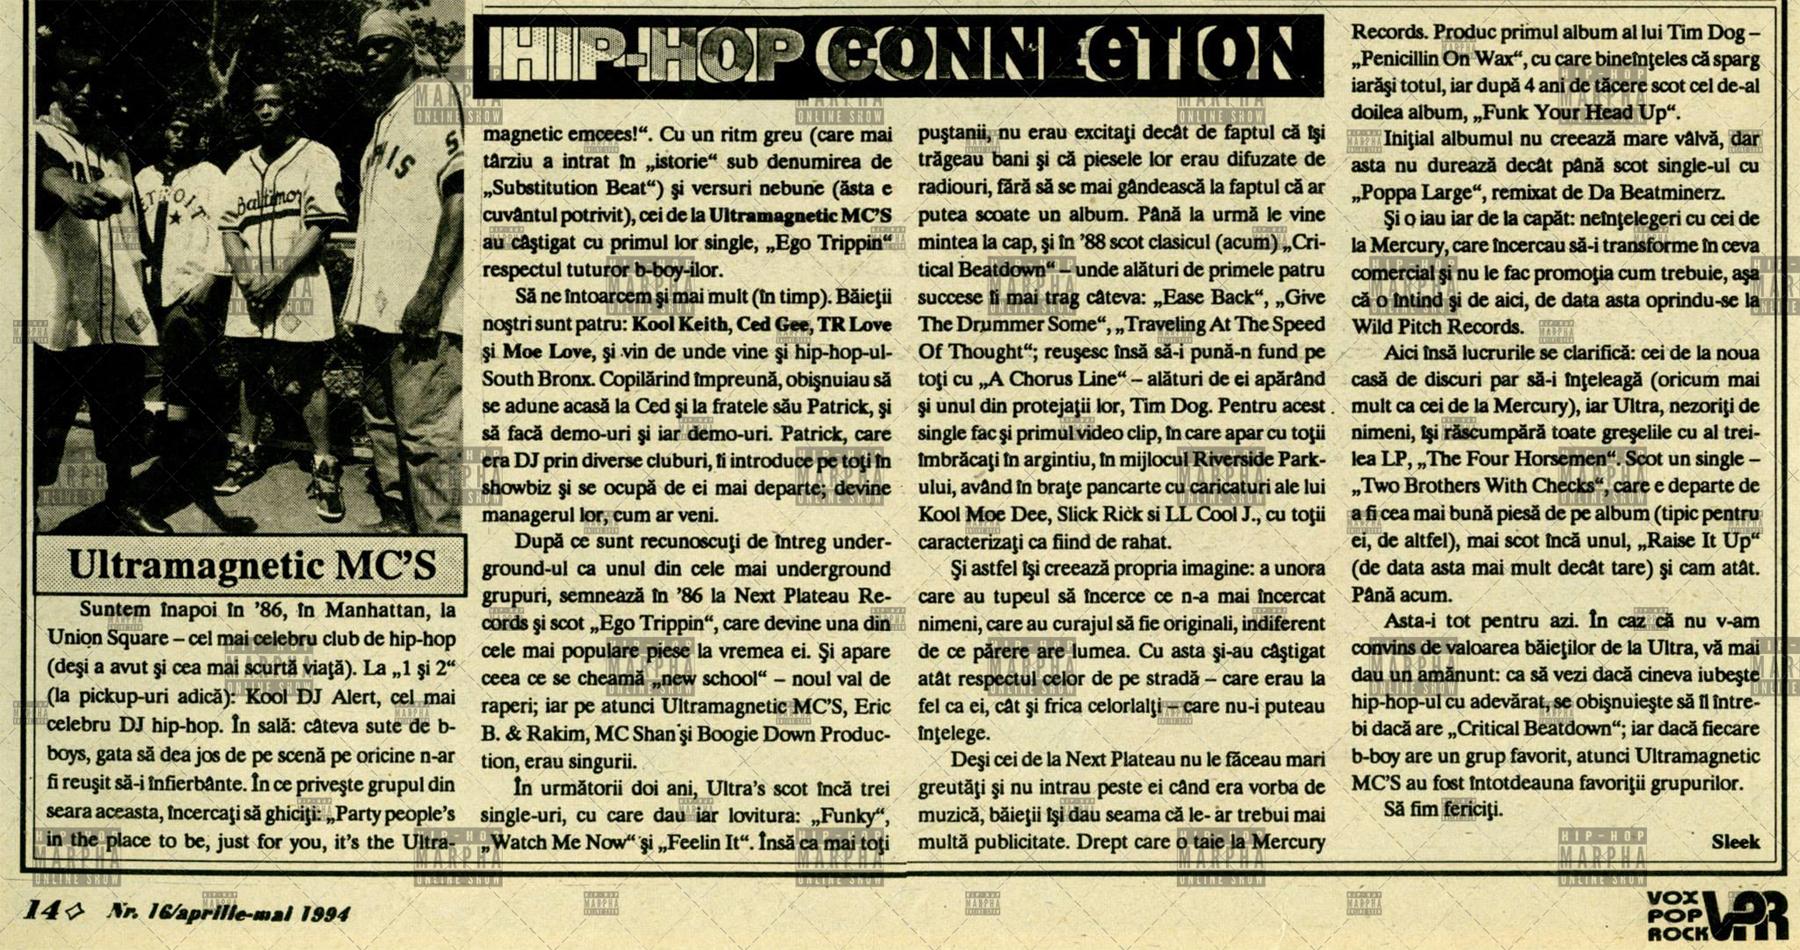 Pagini de istorie HIP HOP CONNECTION (Vox Pop Rock numarul 16, aprilie-mai 1994)